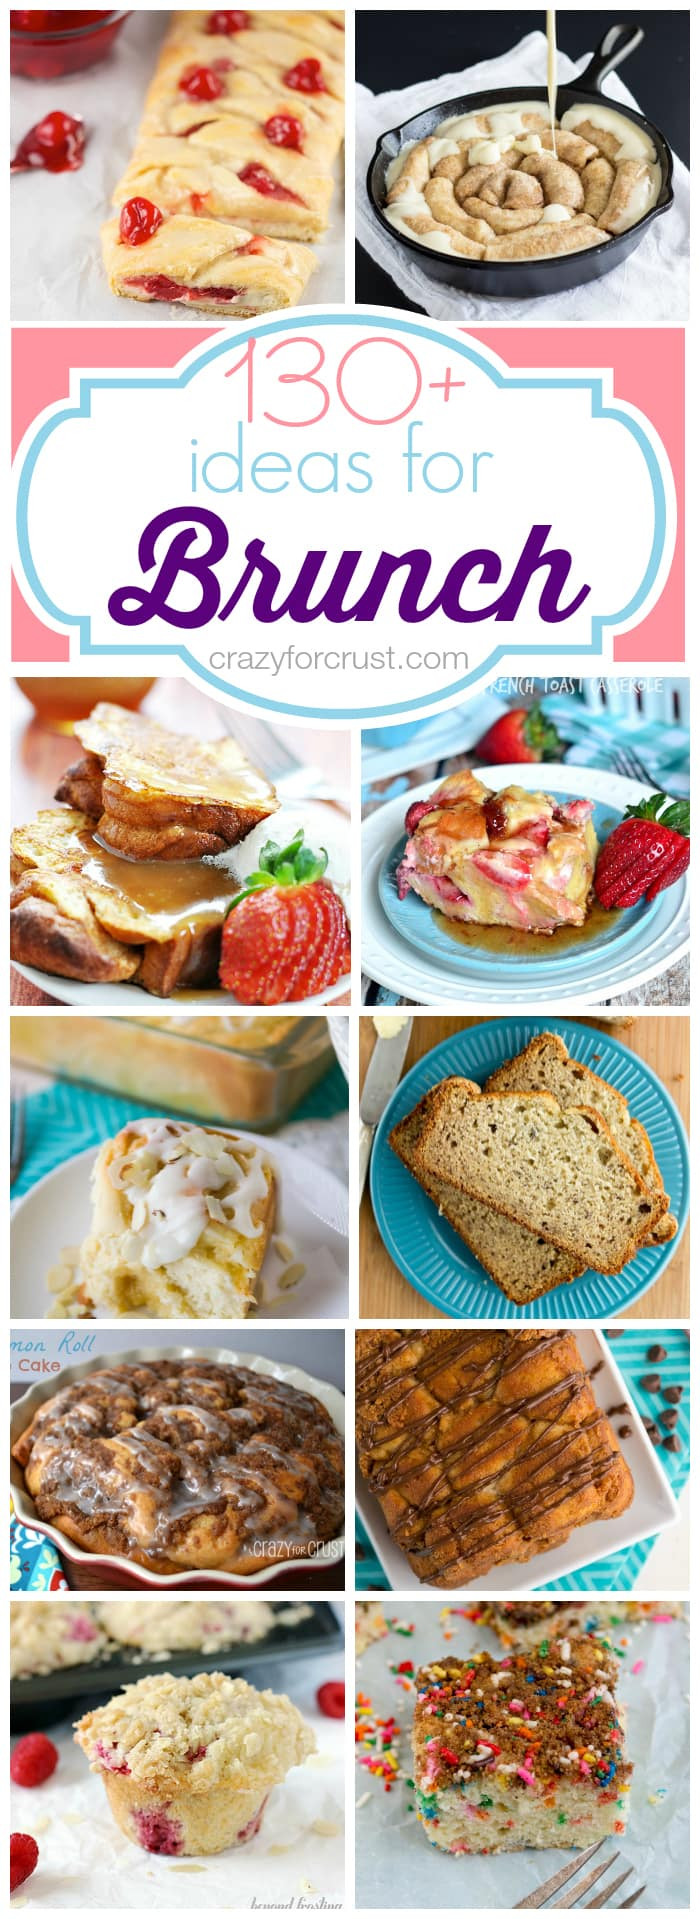 Breakfast Recipe Ideas  Over 130 Brunch Ideas Crazy for Crust